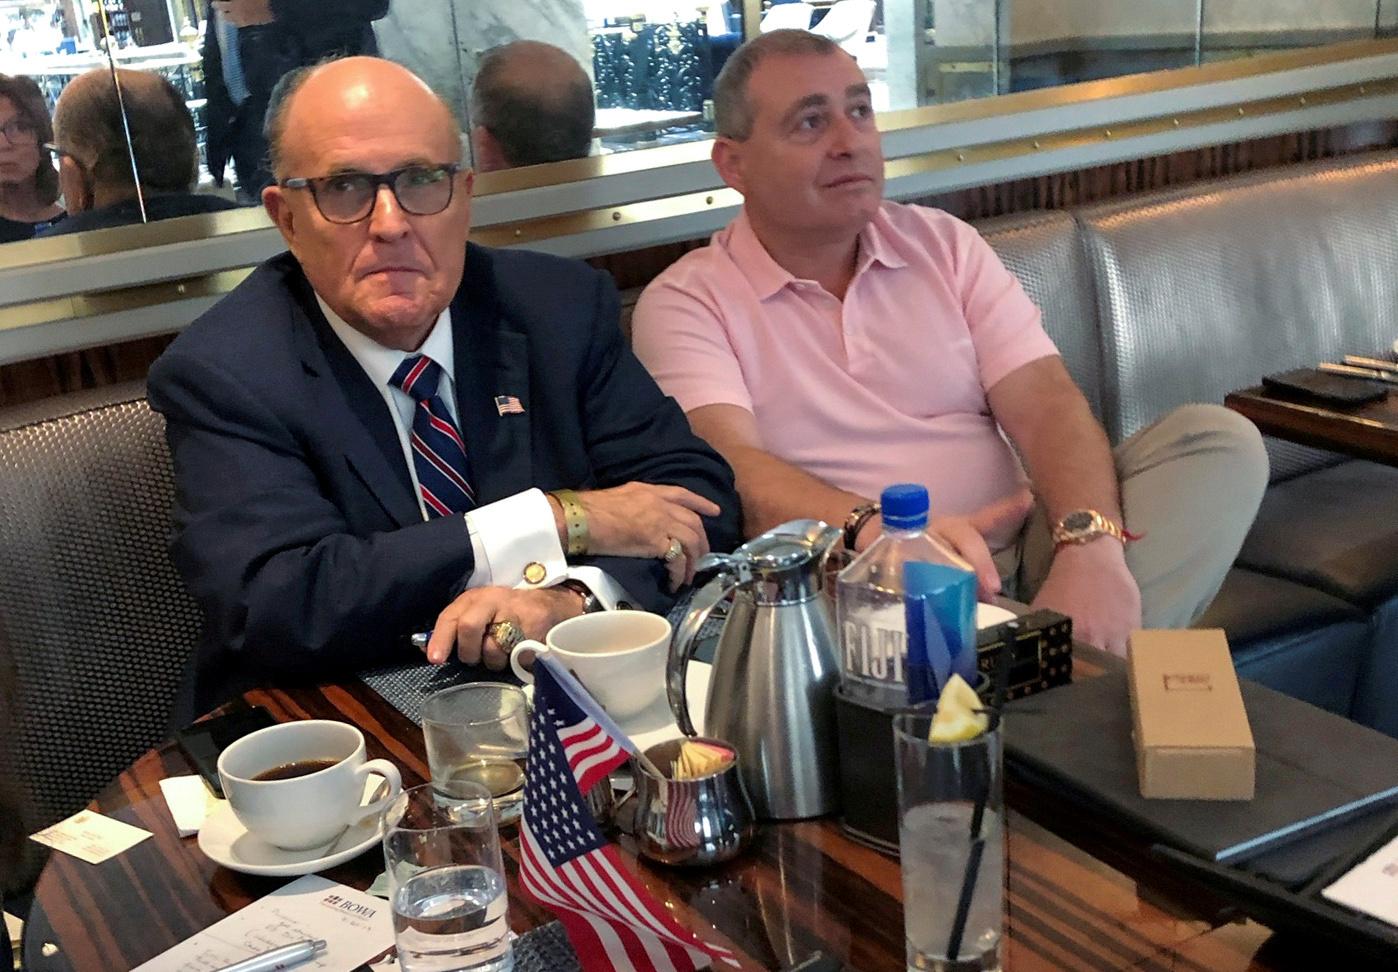 Fourth Defendant Arrested in Probe of Giuliani Associates